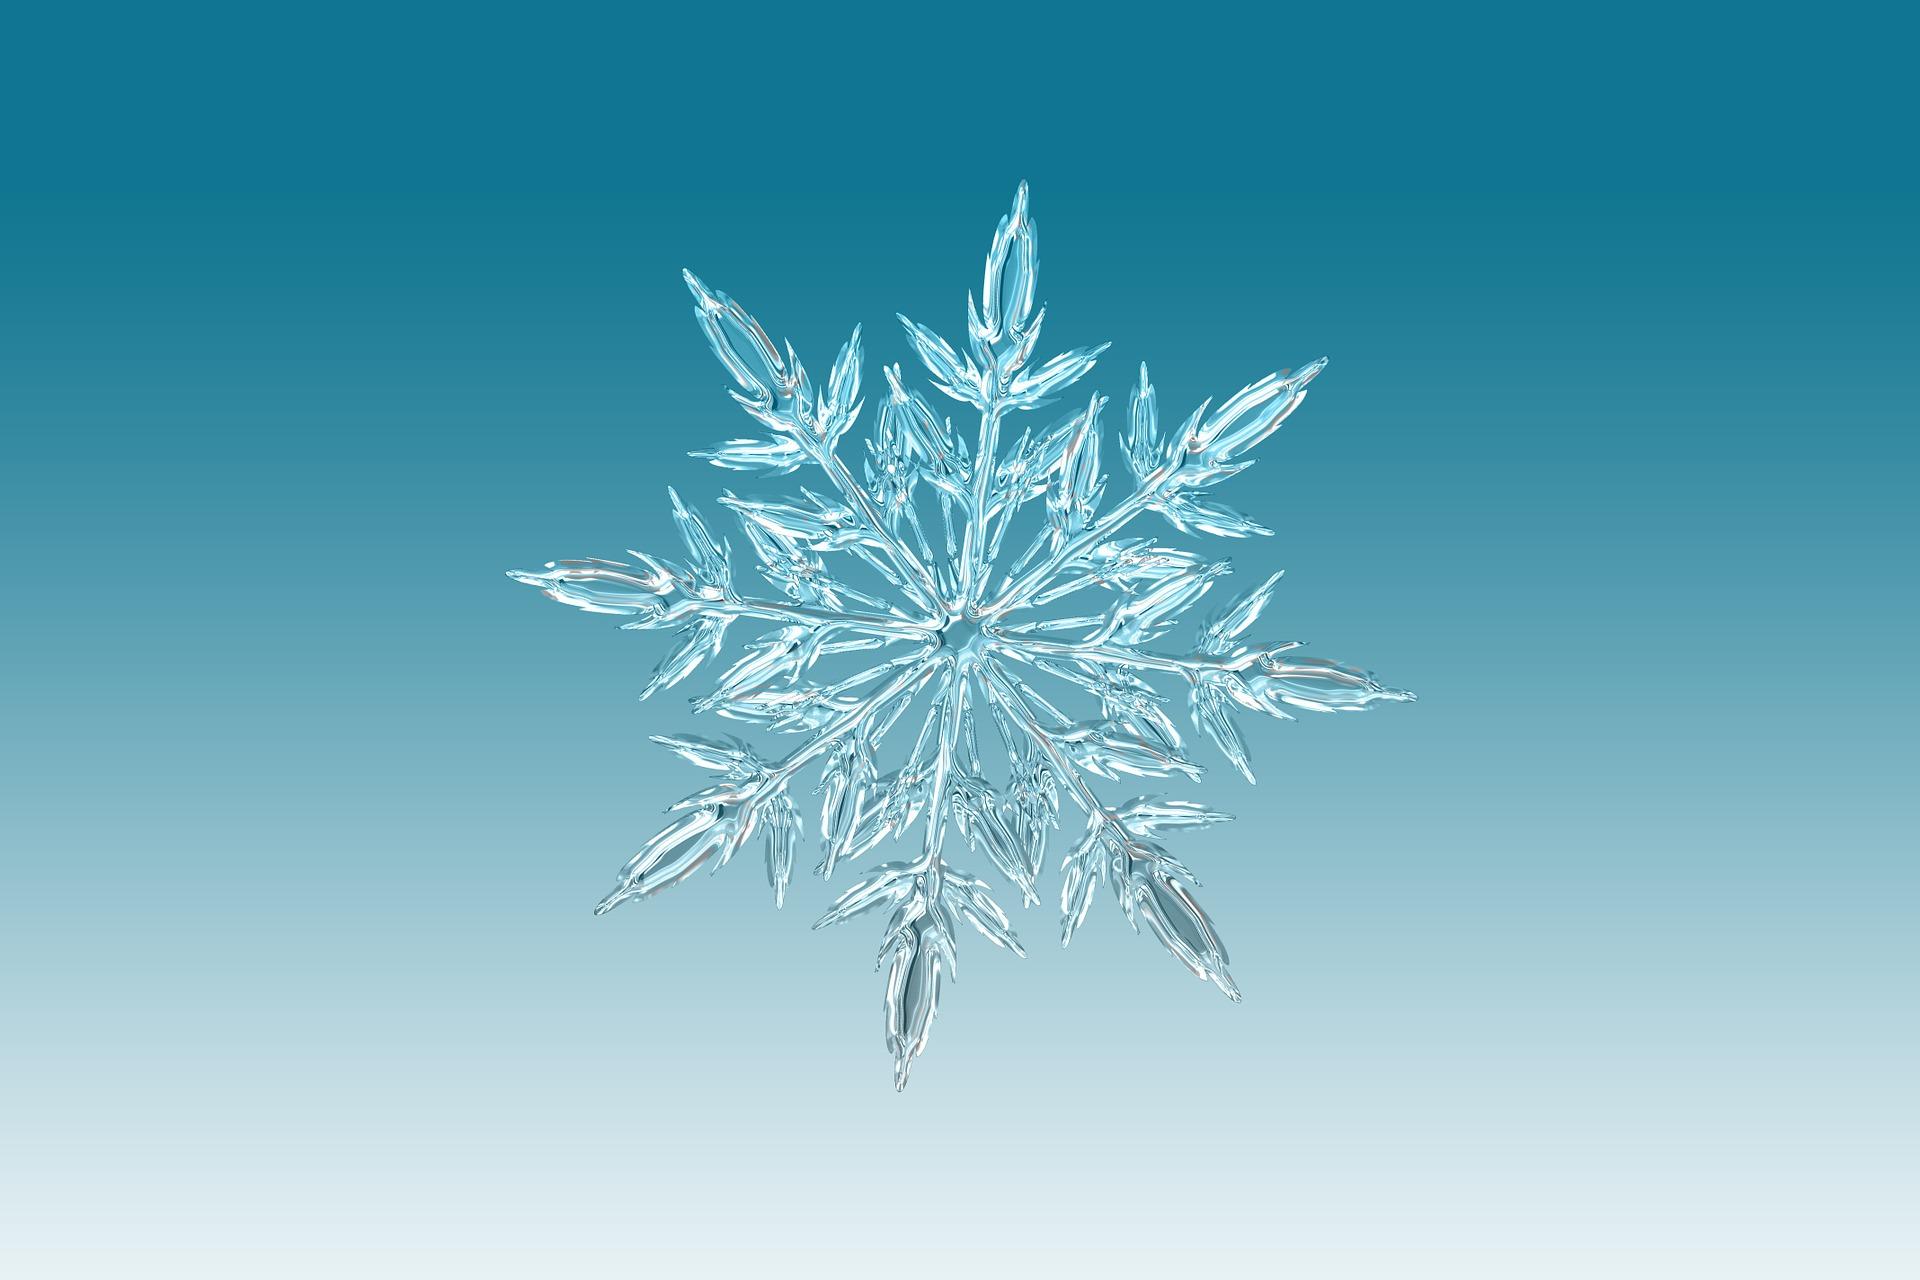 ice-crystal-1065155_1920